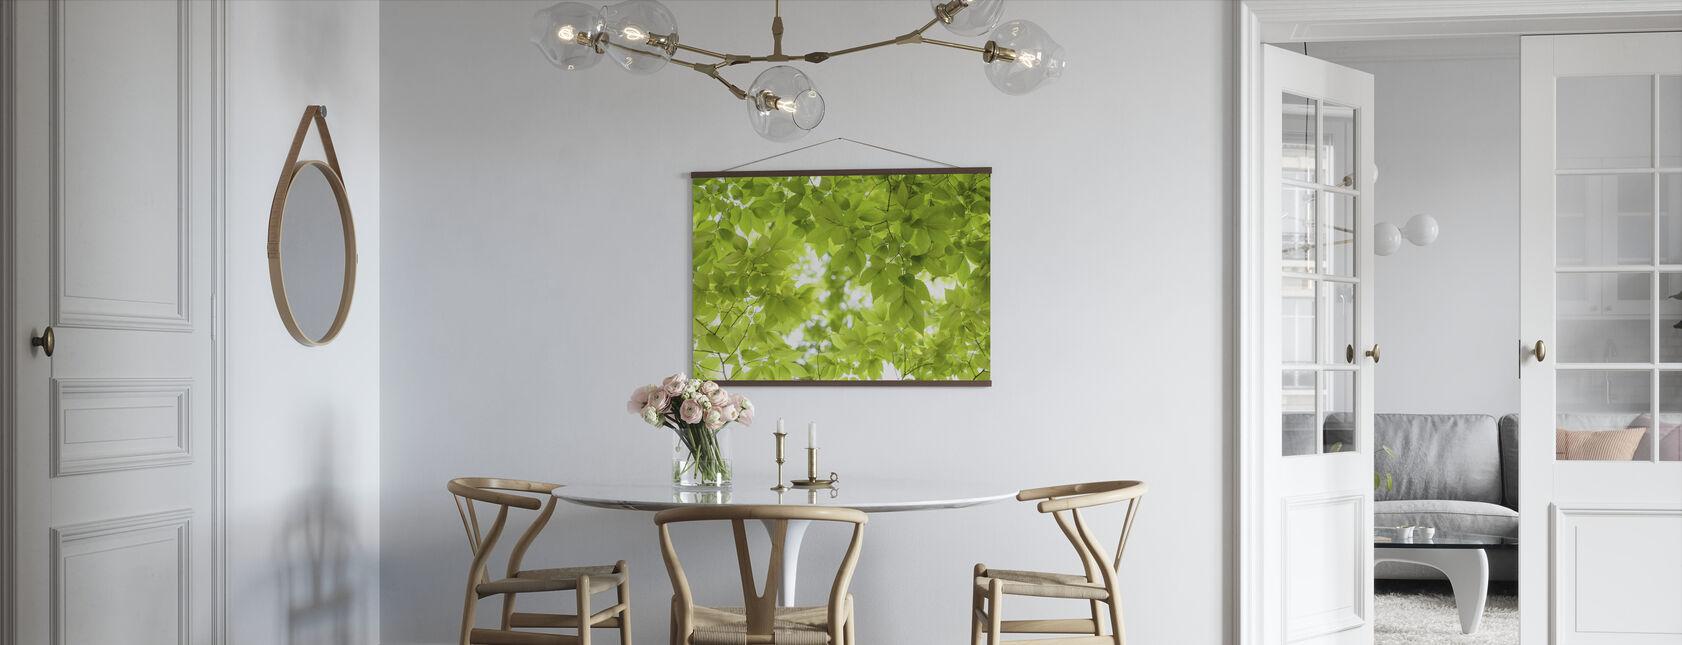 Groene bladeren achtergrond - Poster - Keuken